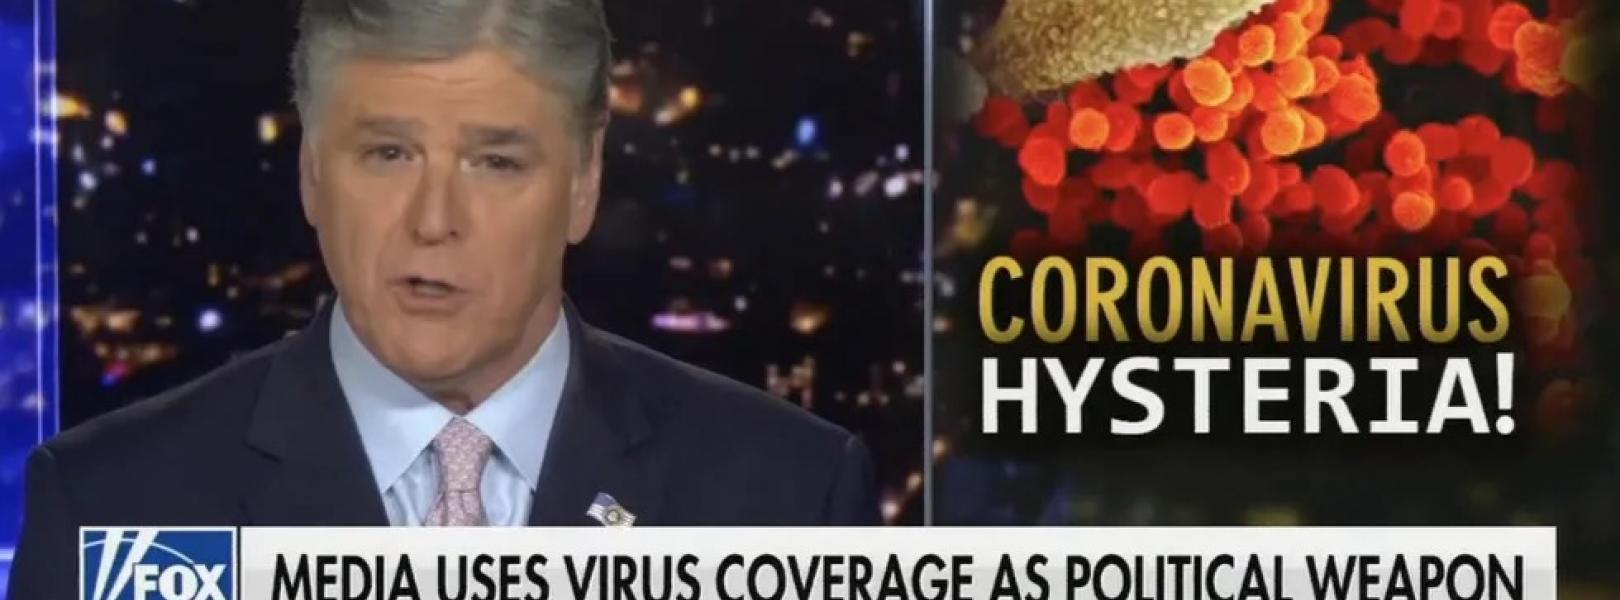 hannity-coronavirus-hysteria-03-10-2020.jpg